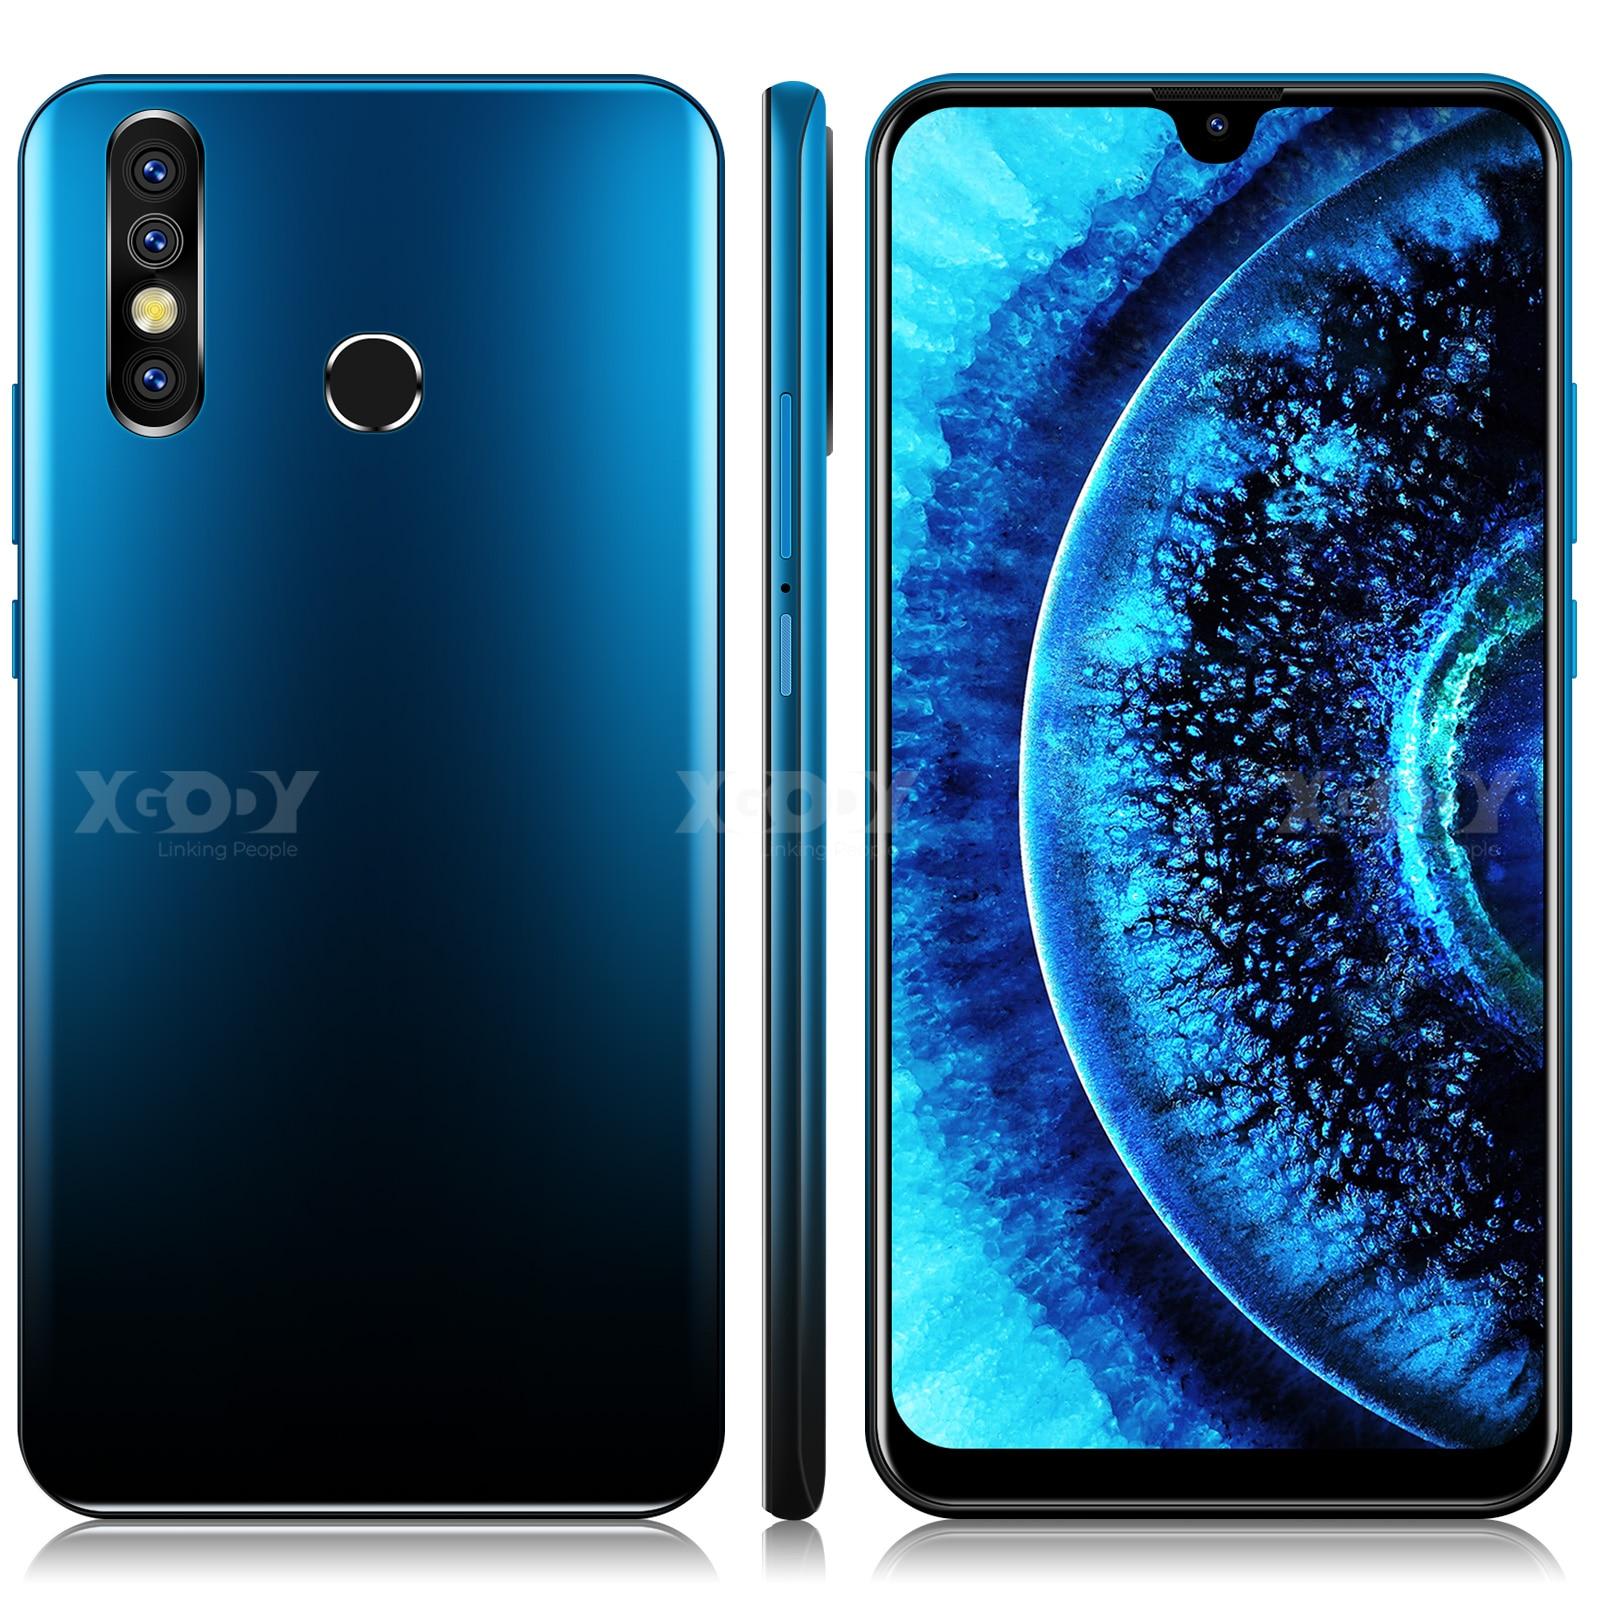 XGODY A70s 3G Smartphone 7.2